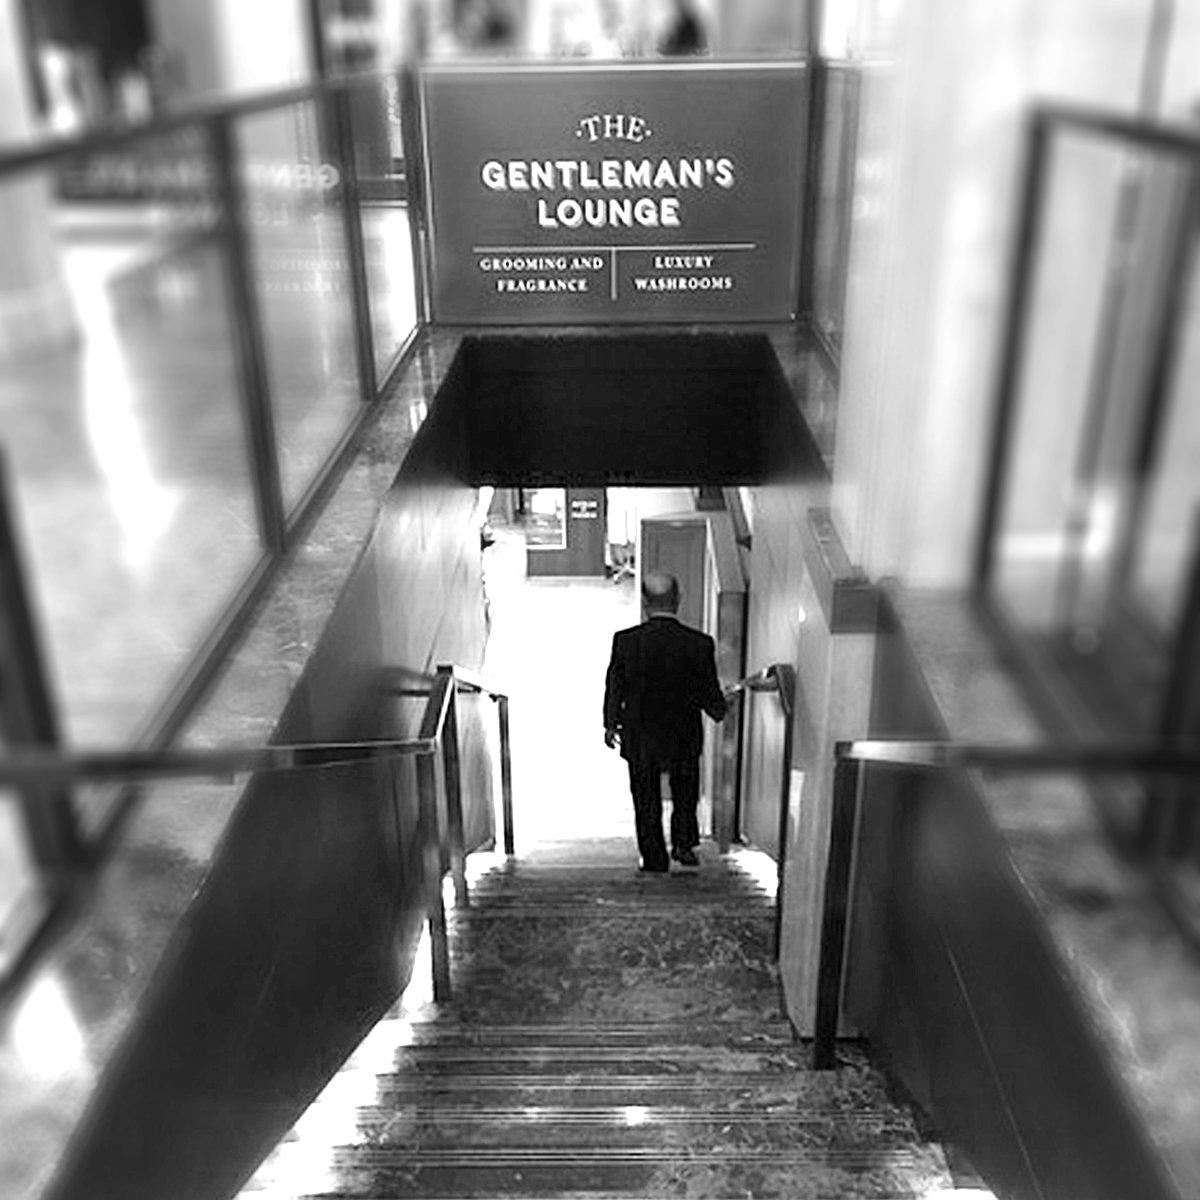 Bolin Webb On Twitter Visiting London Find Us In The Gentleman S Lounge At Harrods Gentleman Gentlemen Gentlemenslounge Harrods Departmentstore Luxurygrooming Mensgrooming Shopping Giftsformen Luxurygifts Luxurygiftsformen British